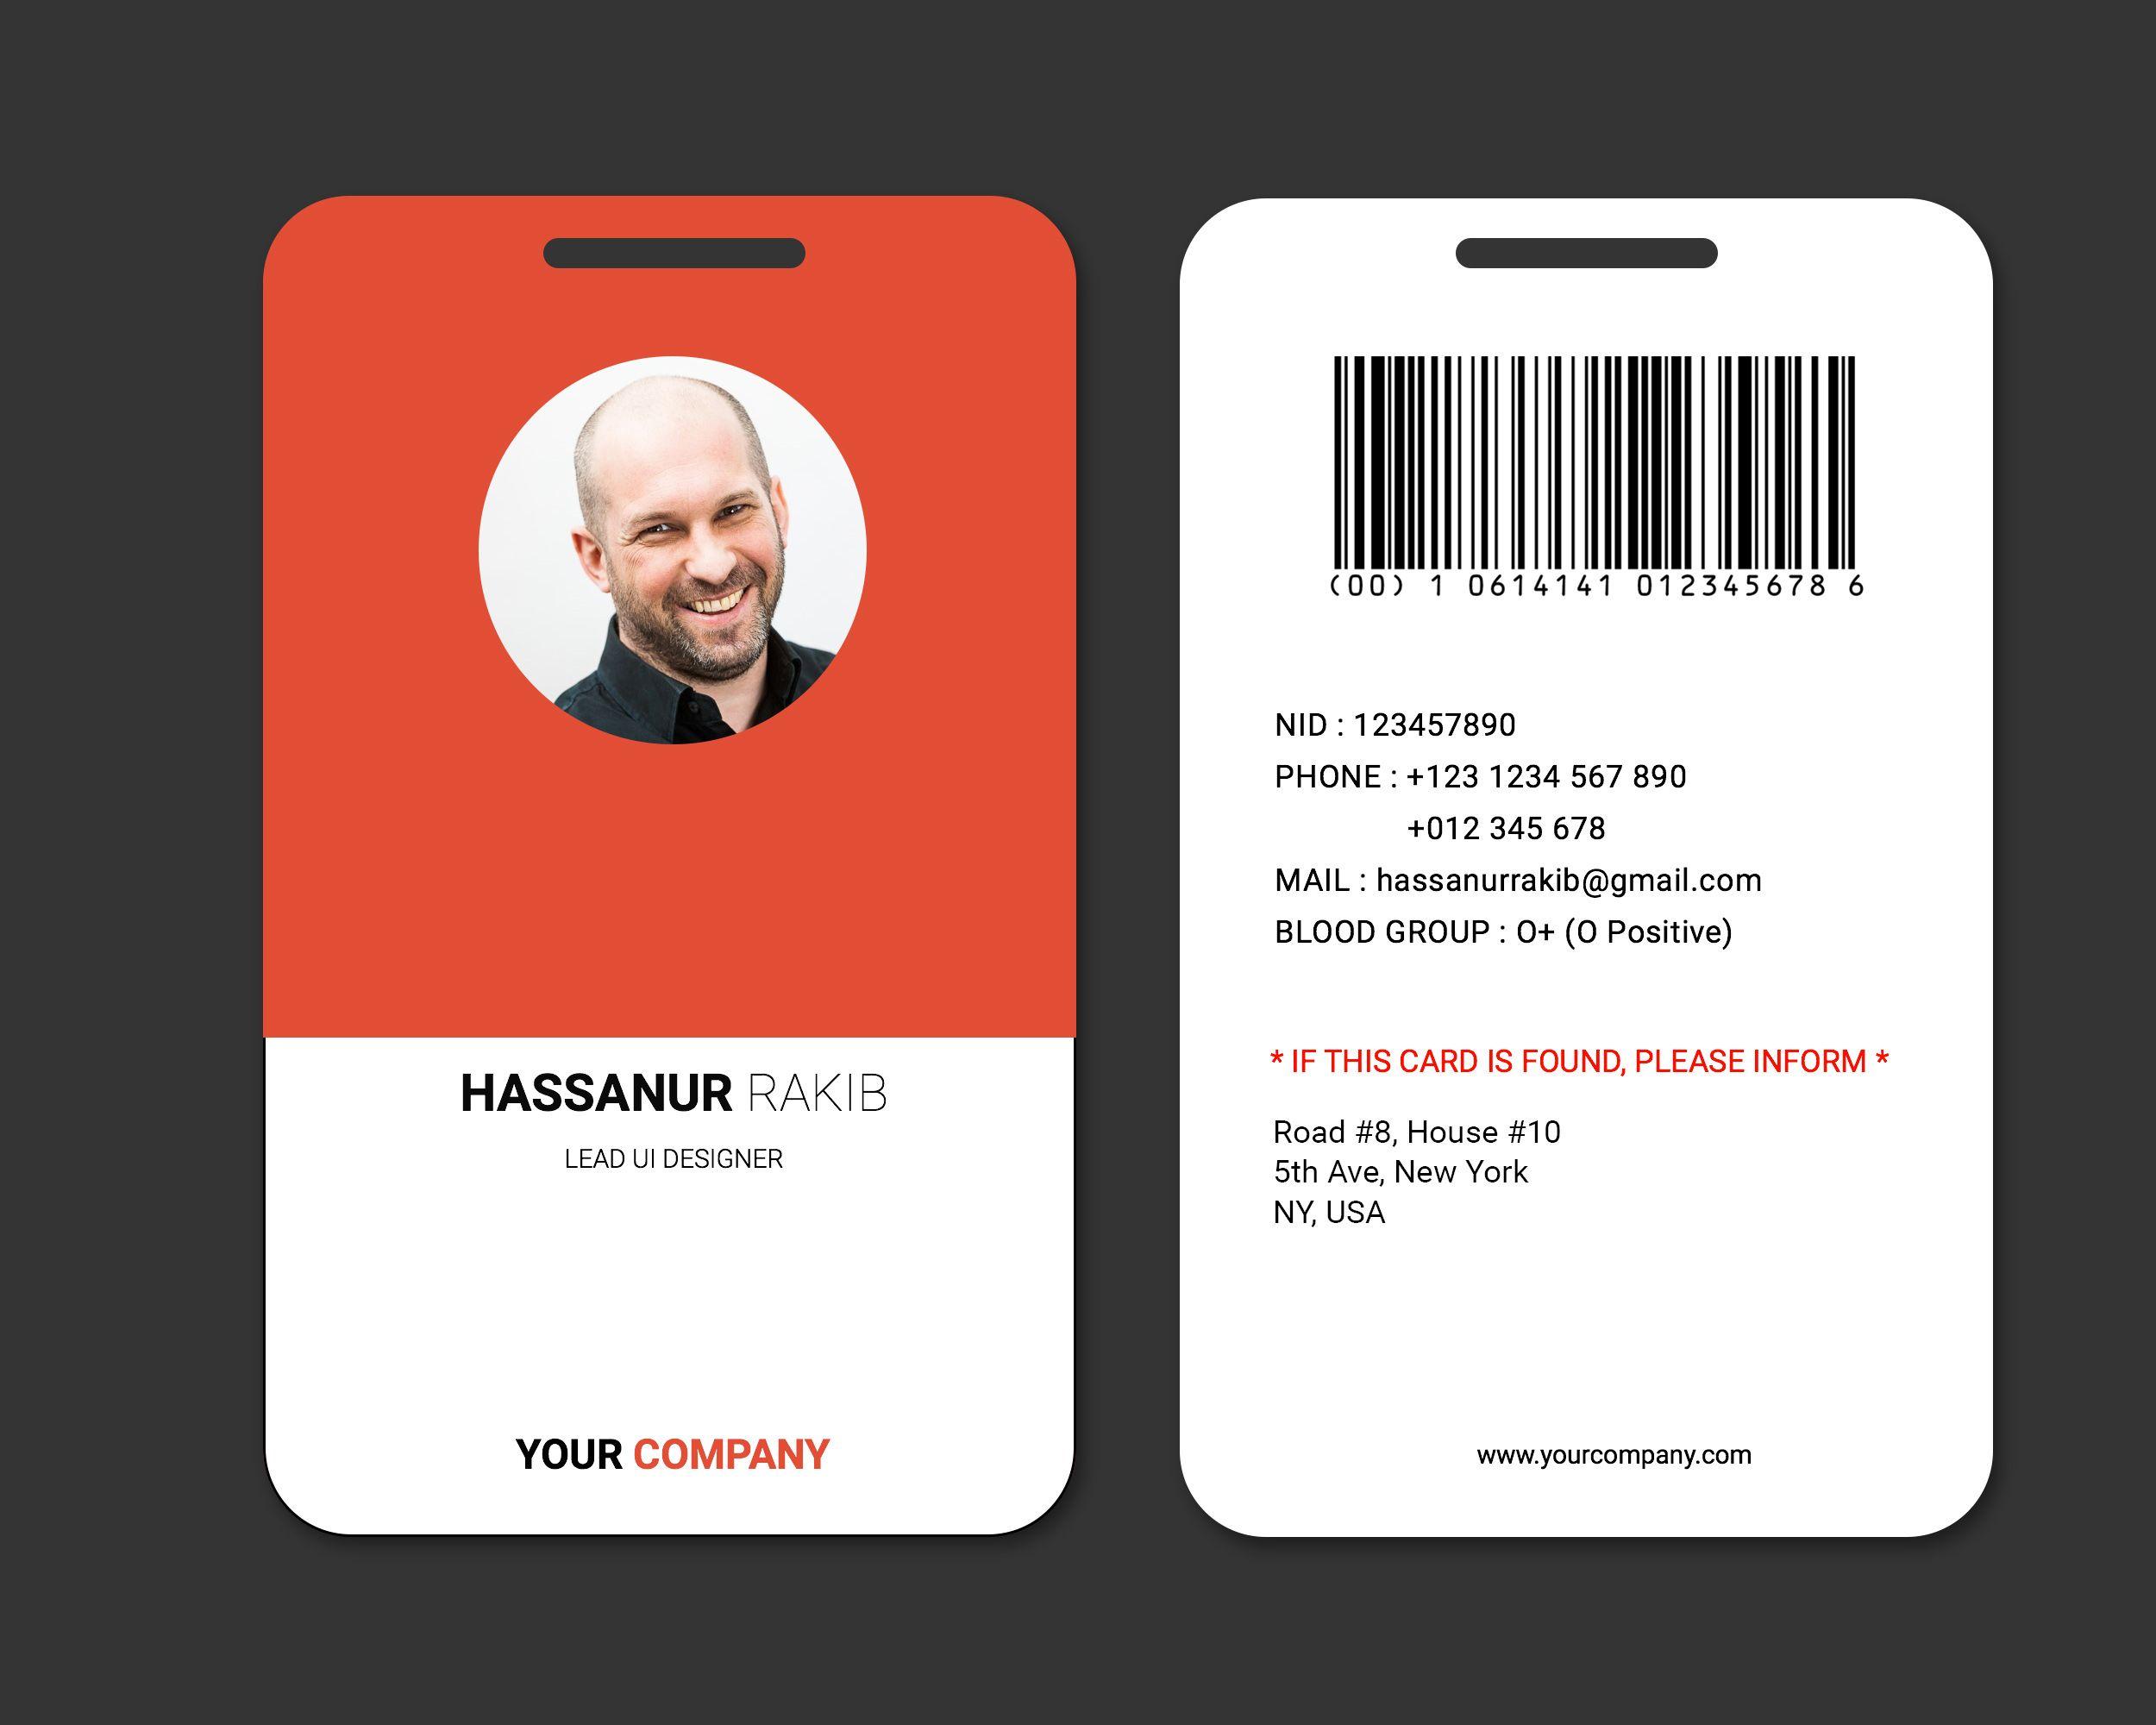 Corporate office badge for employee credenciales de